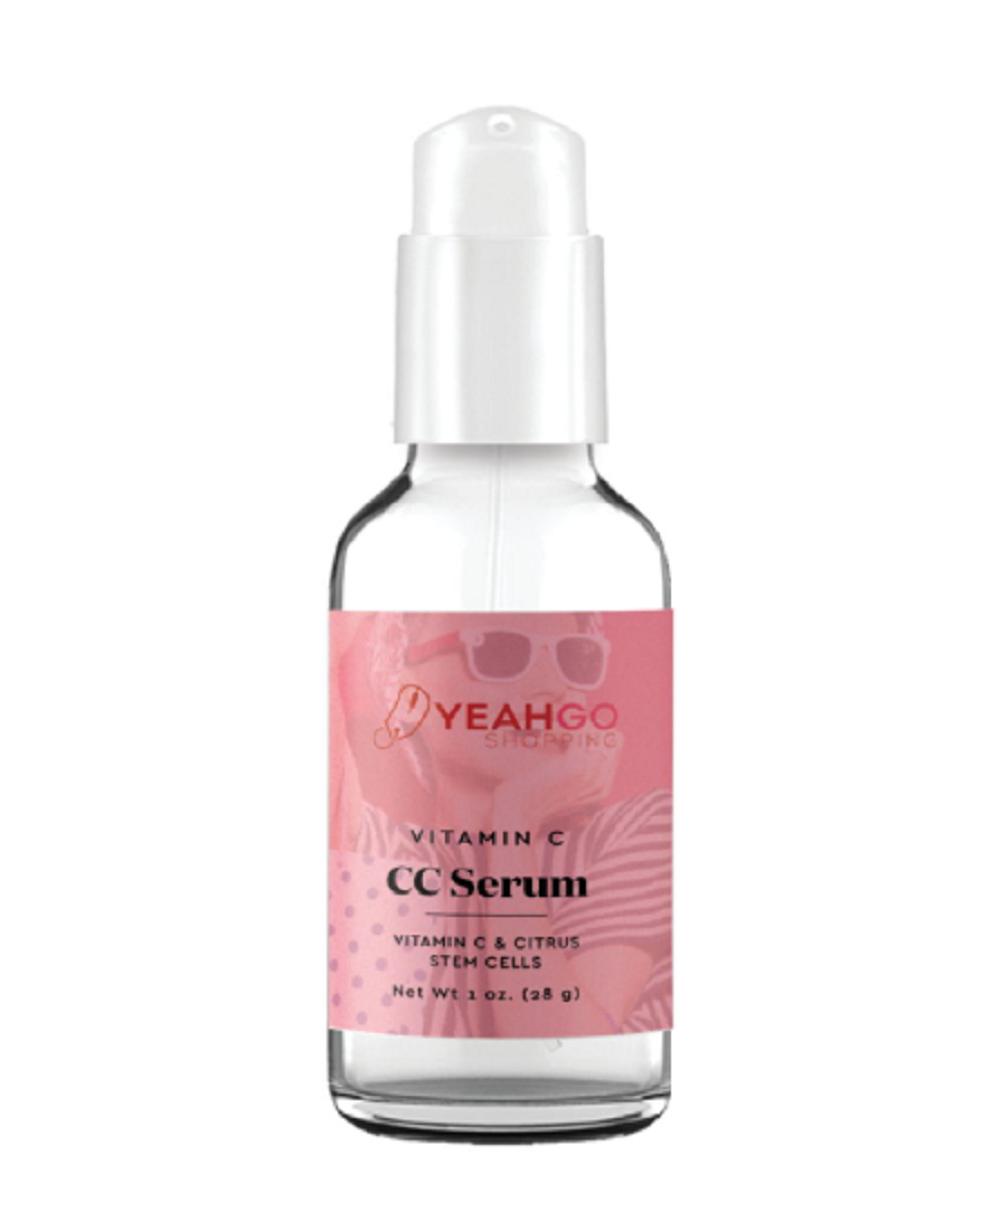 YEAHGOSHOPPING CC SERUM WITH VITAMIN C & CITRUS STEM CELLS - 1oz (28g)